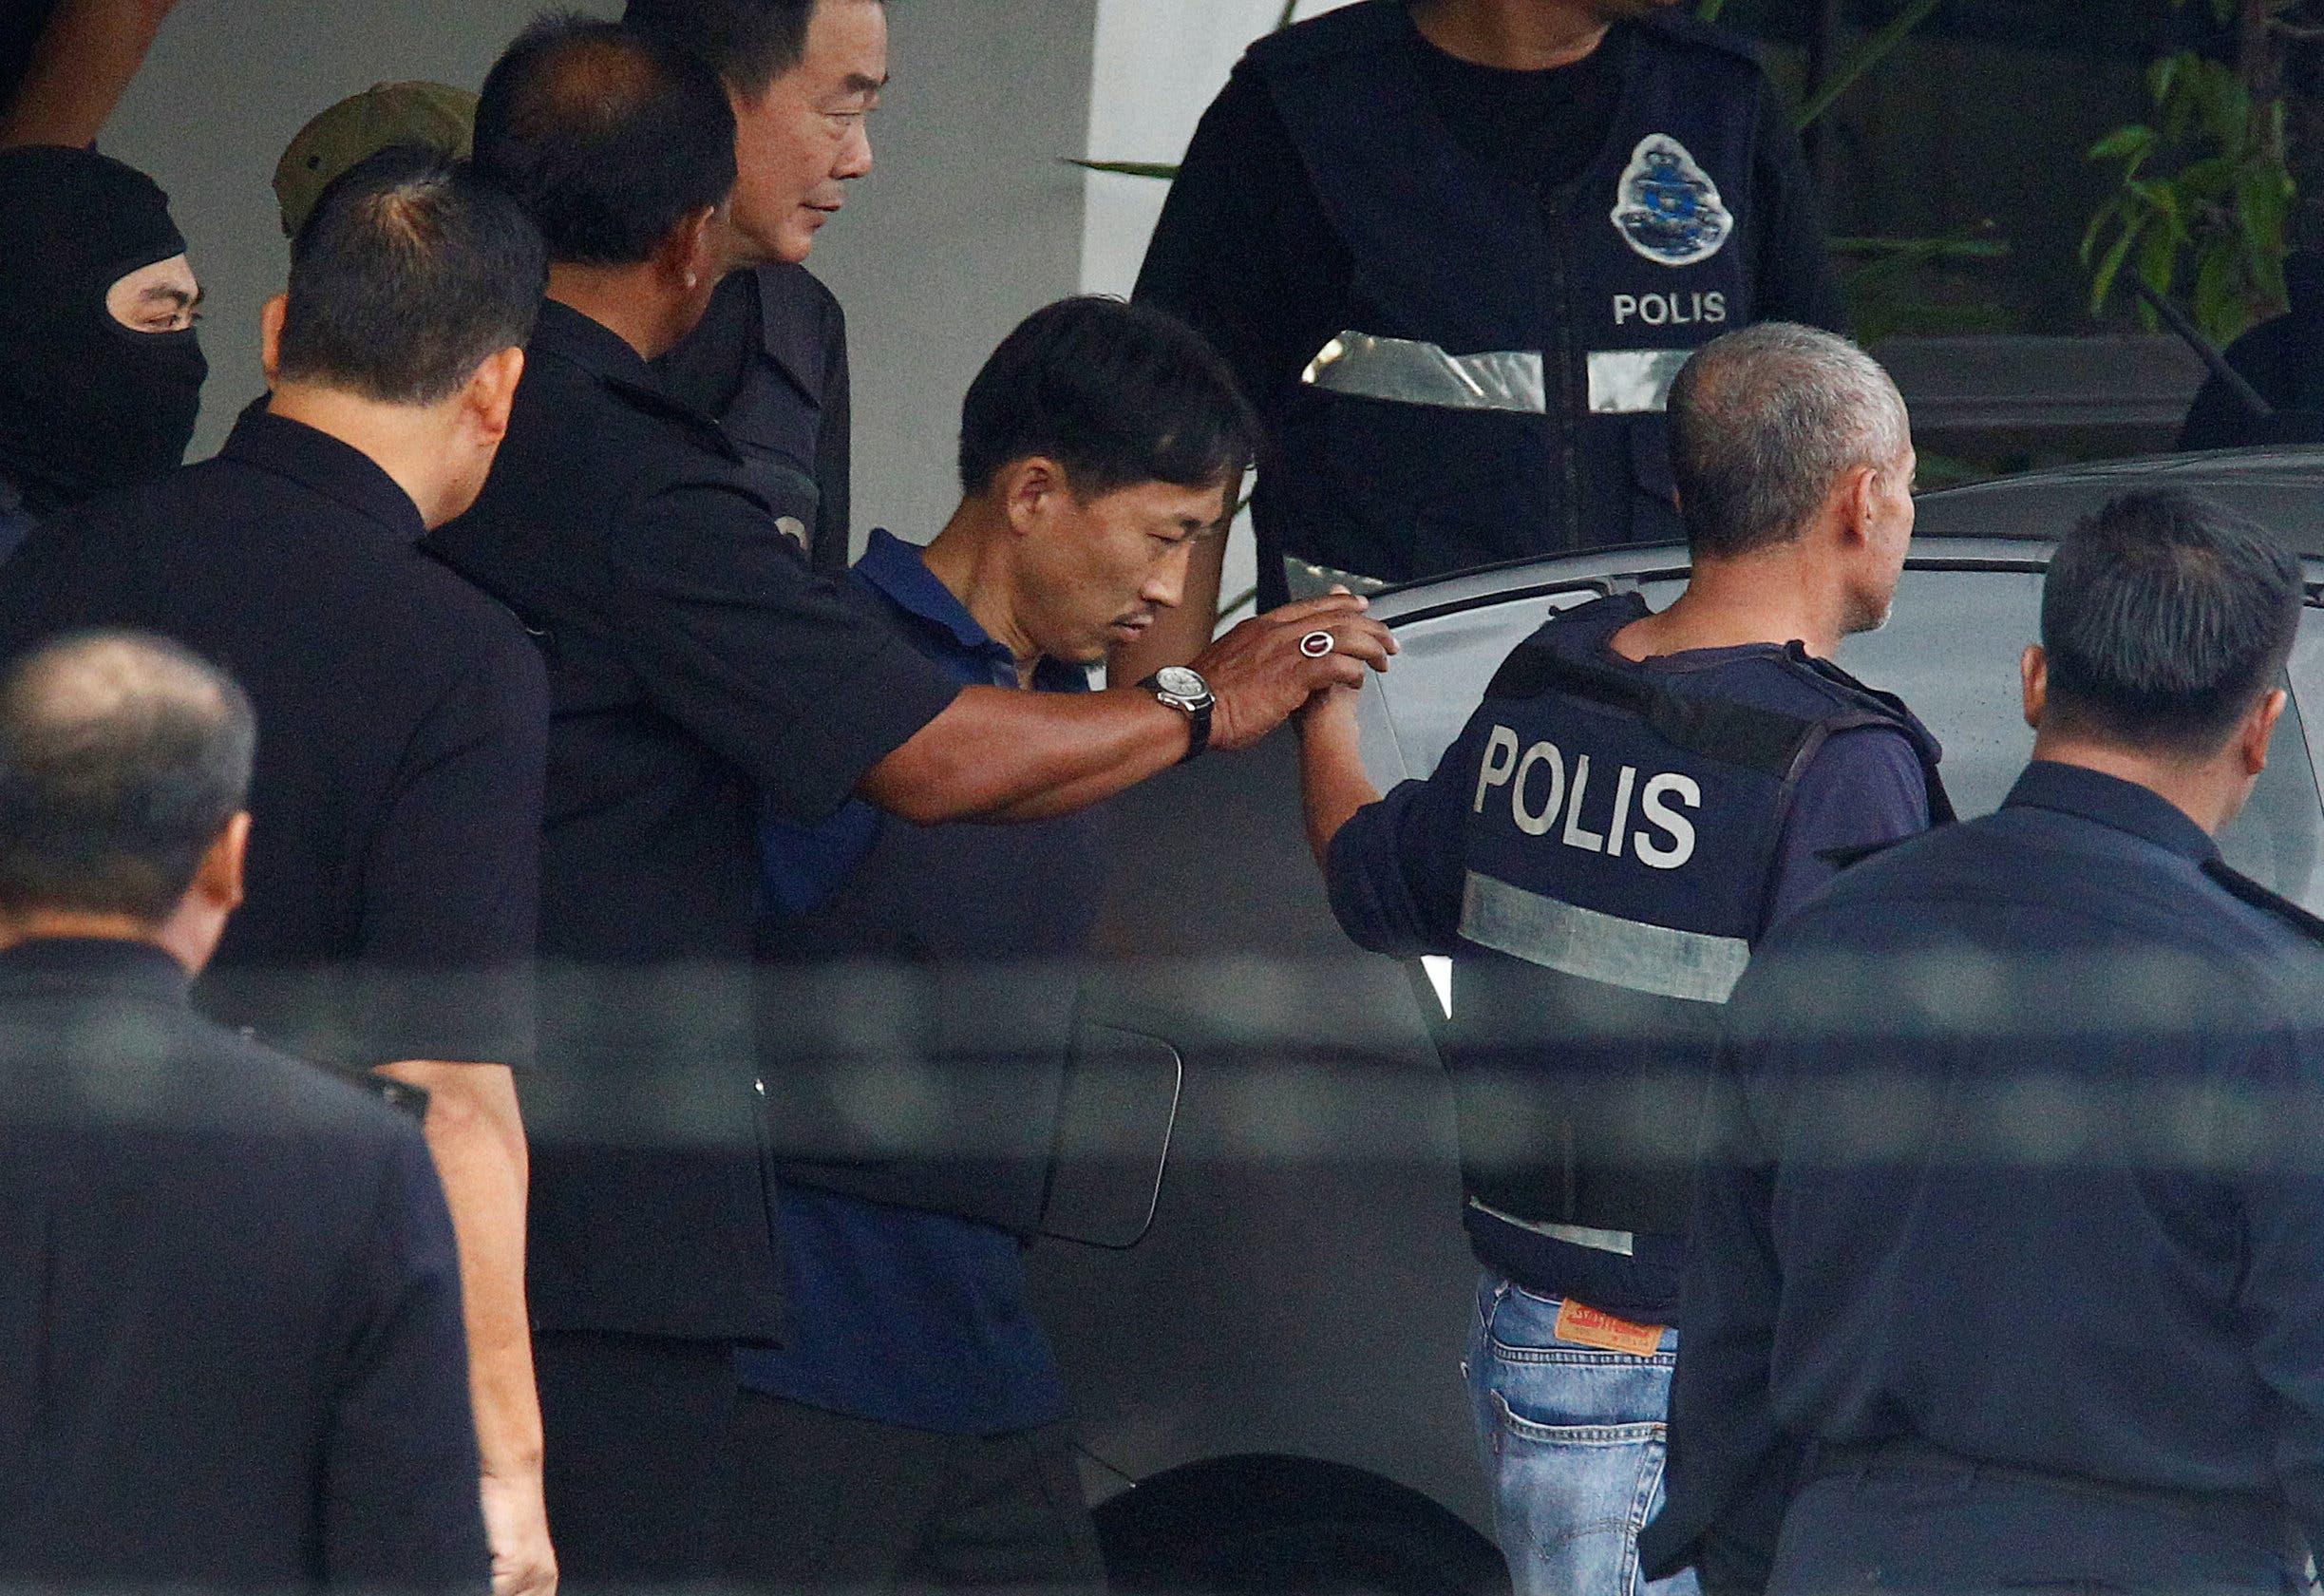 ري يونغ تشول يخرج من مركز شرطة ماليزي استعداداً لترحيله